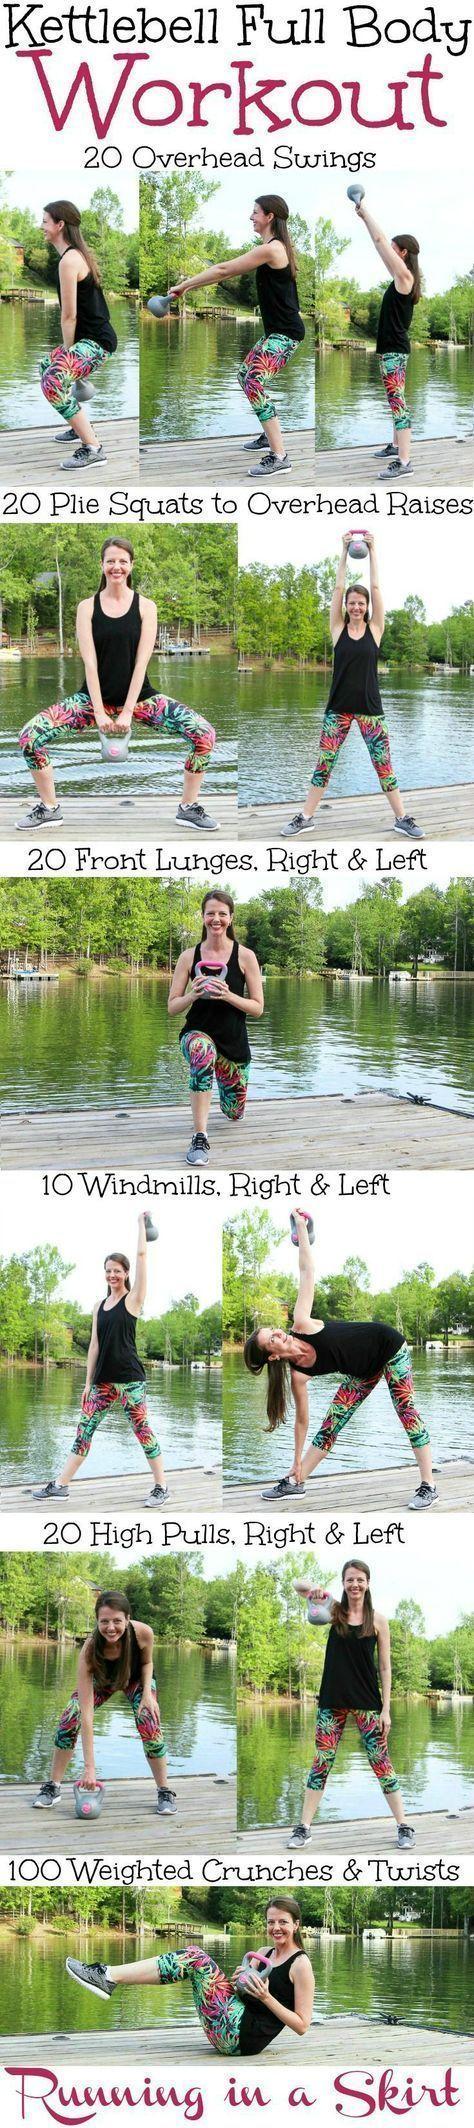 kettlebell full body workout  | Posted By: CustomWeightLossProgram.com